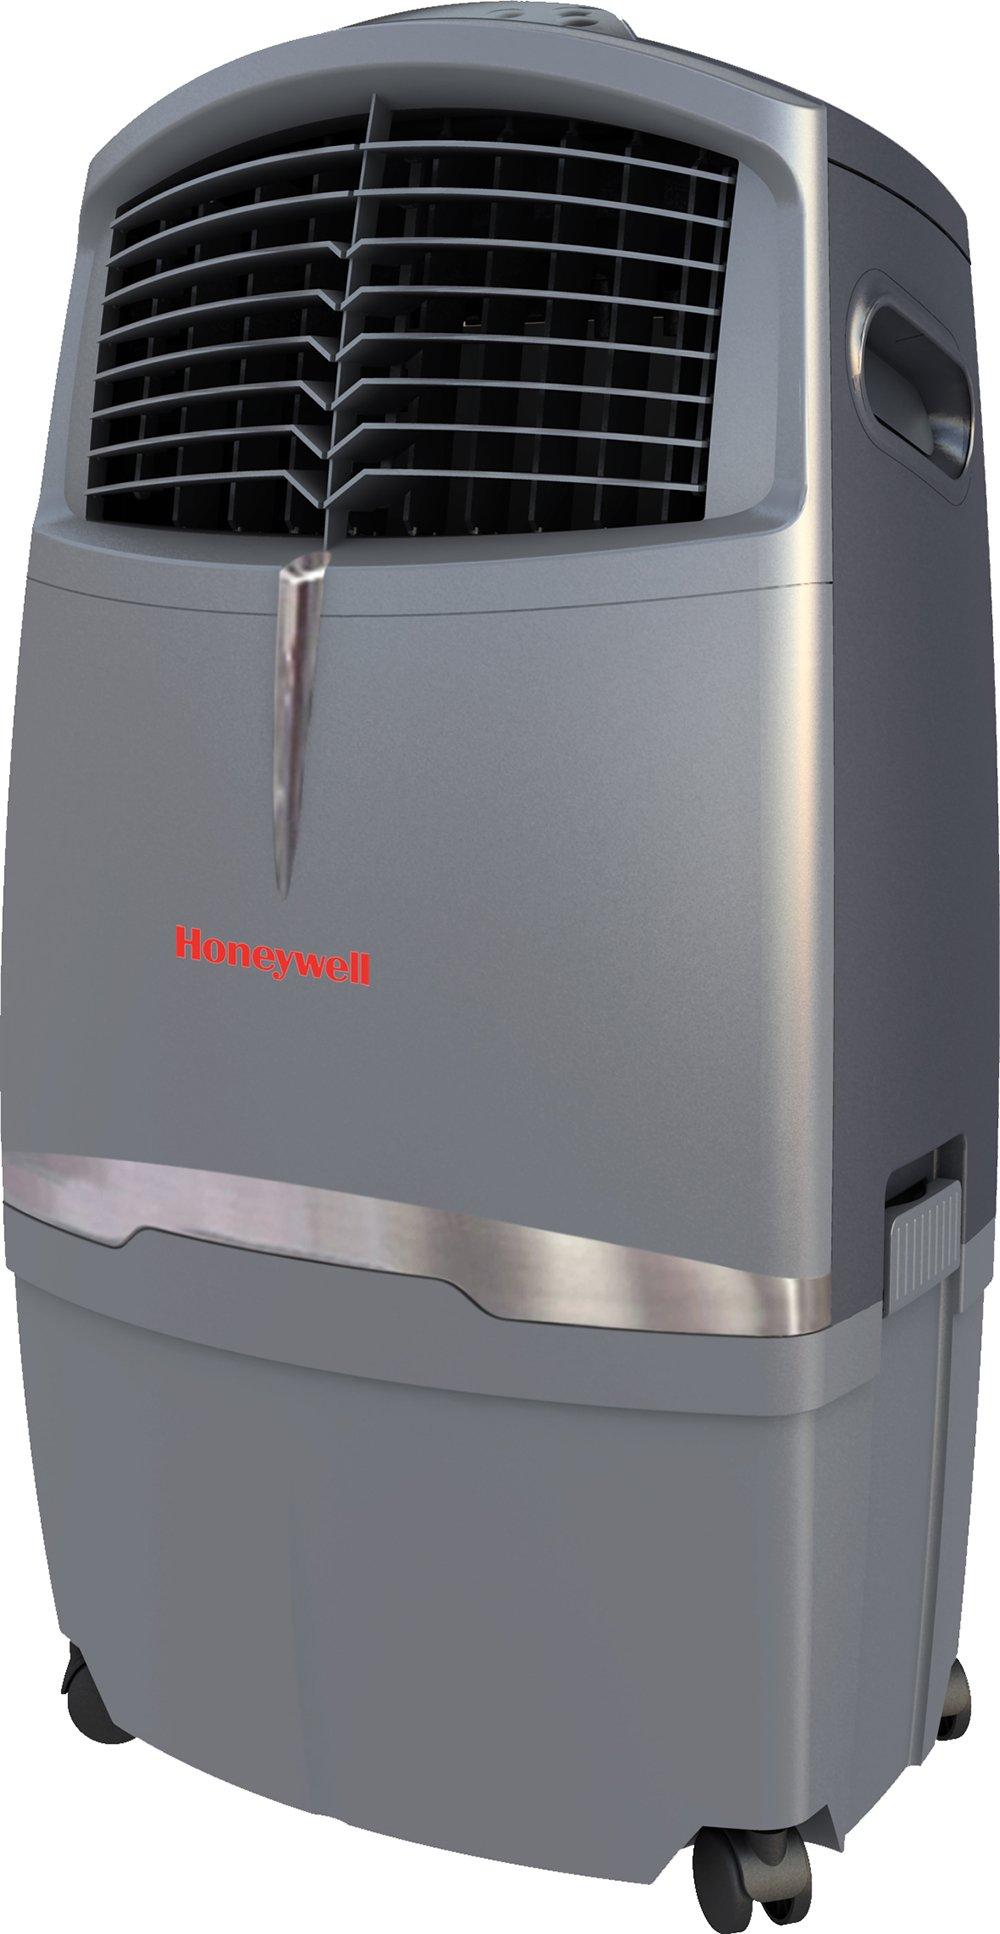 Honeywell 63 Pint Evaporative Air Cooler - CL30XC